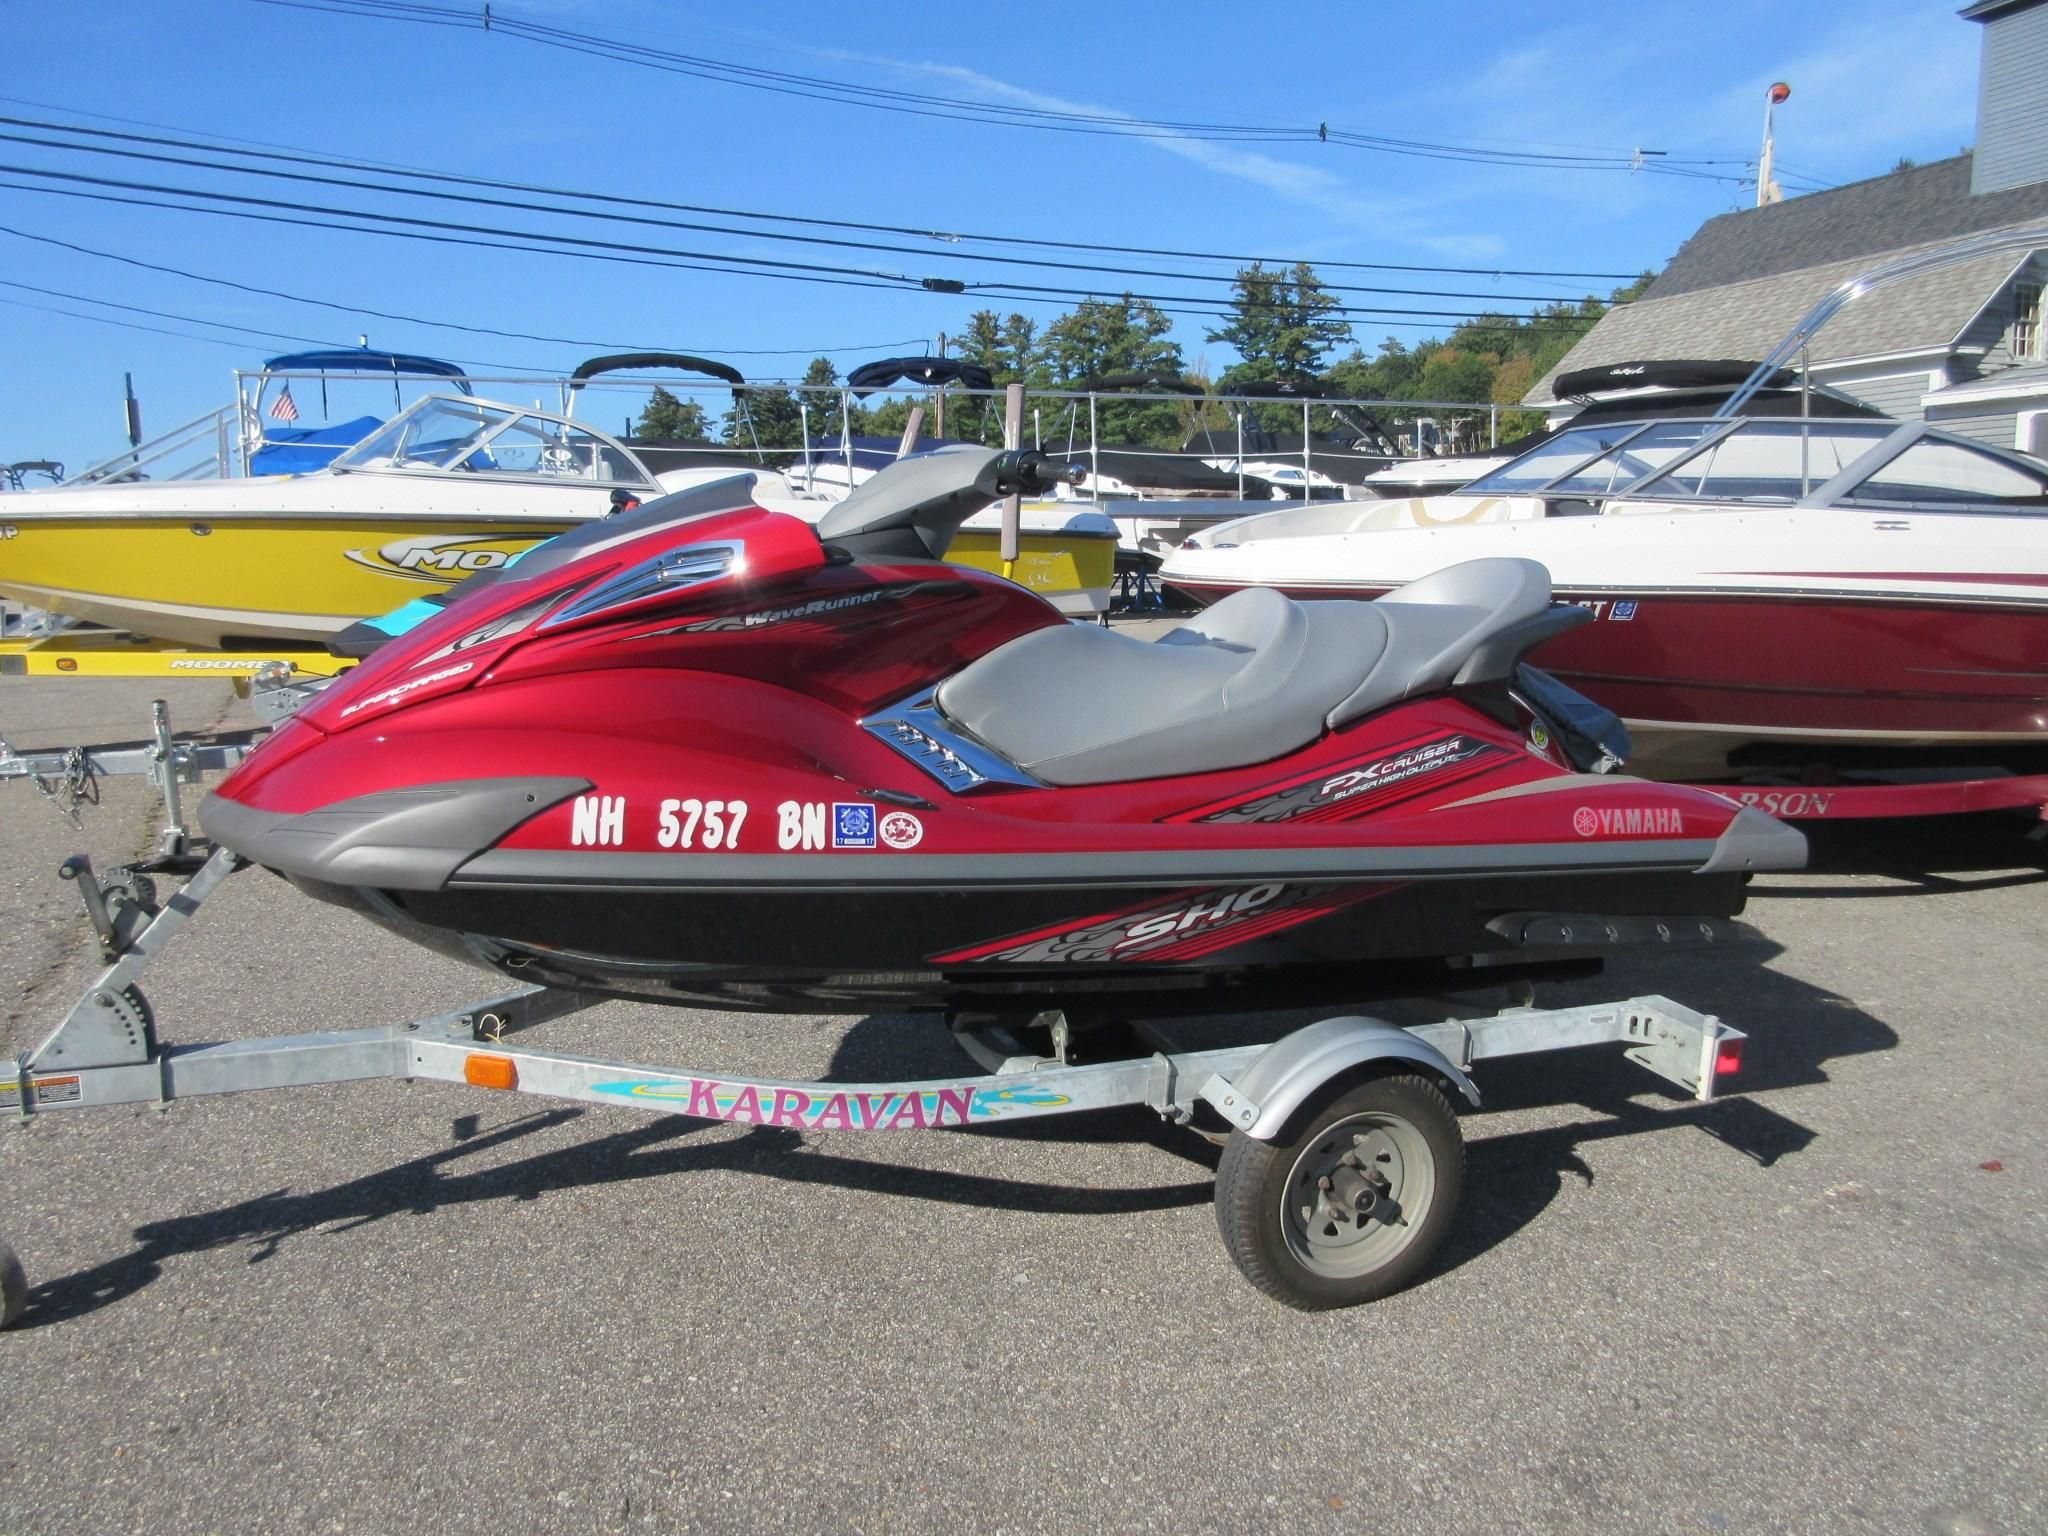 2009 yamaha waverunner fx cruiser sho power boat for sale for 2006 yamaha waverunner